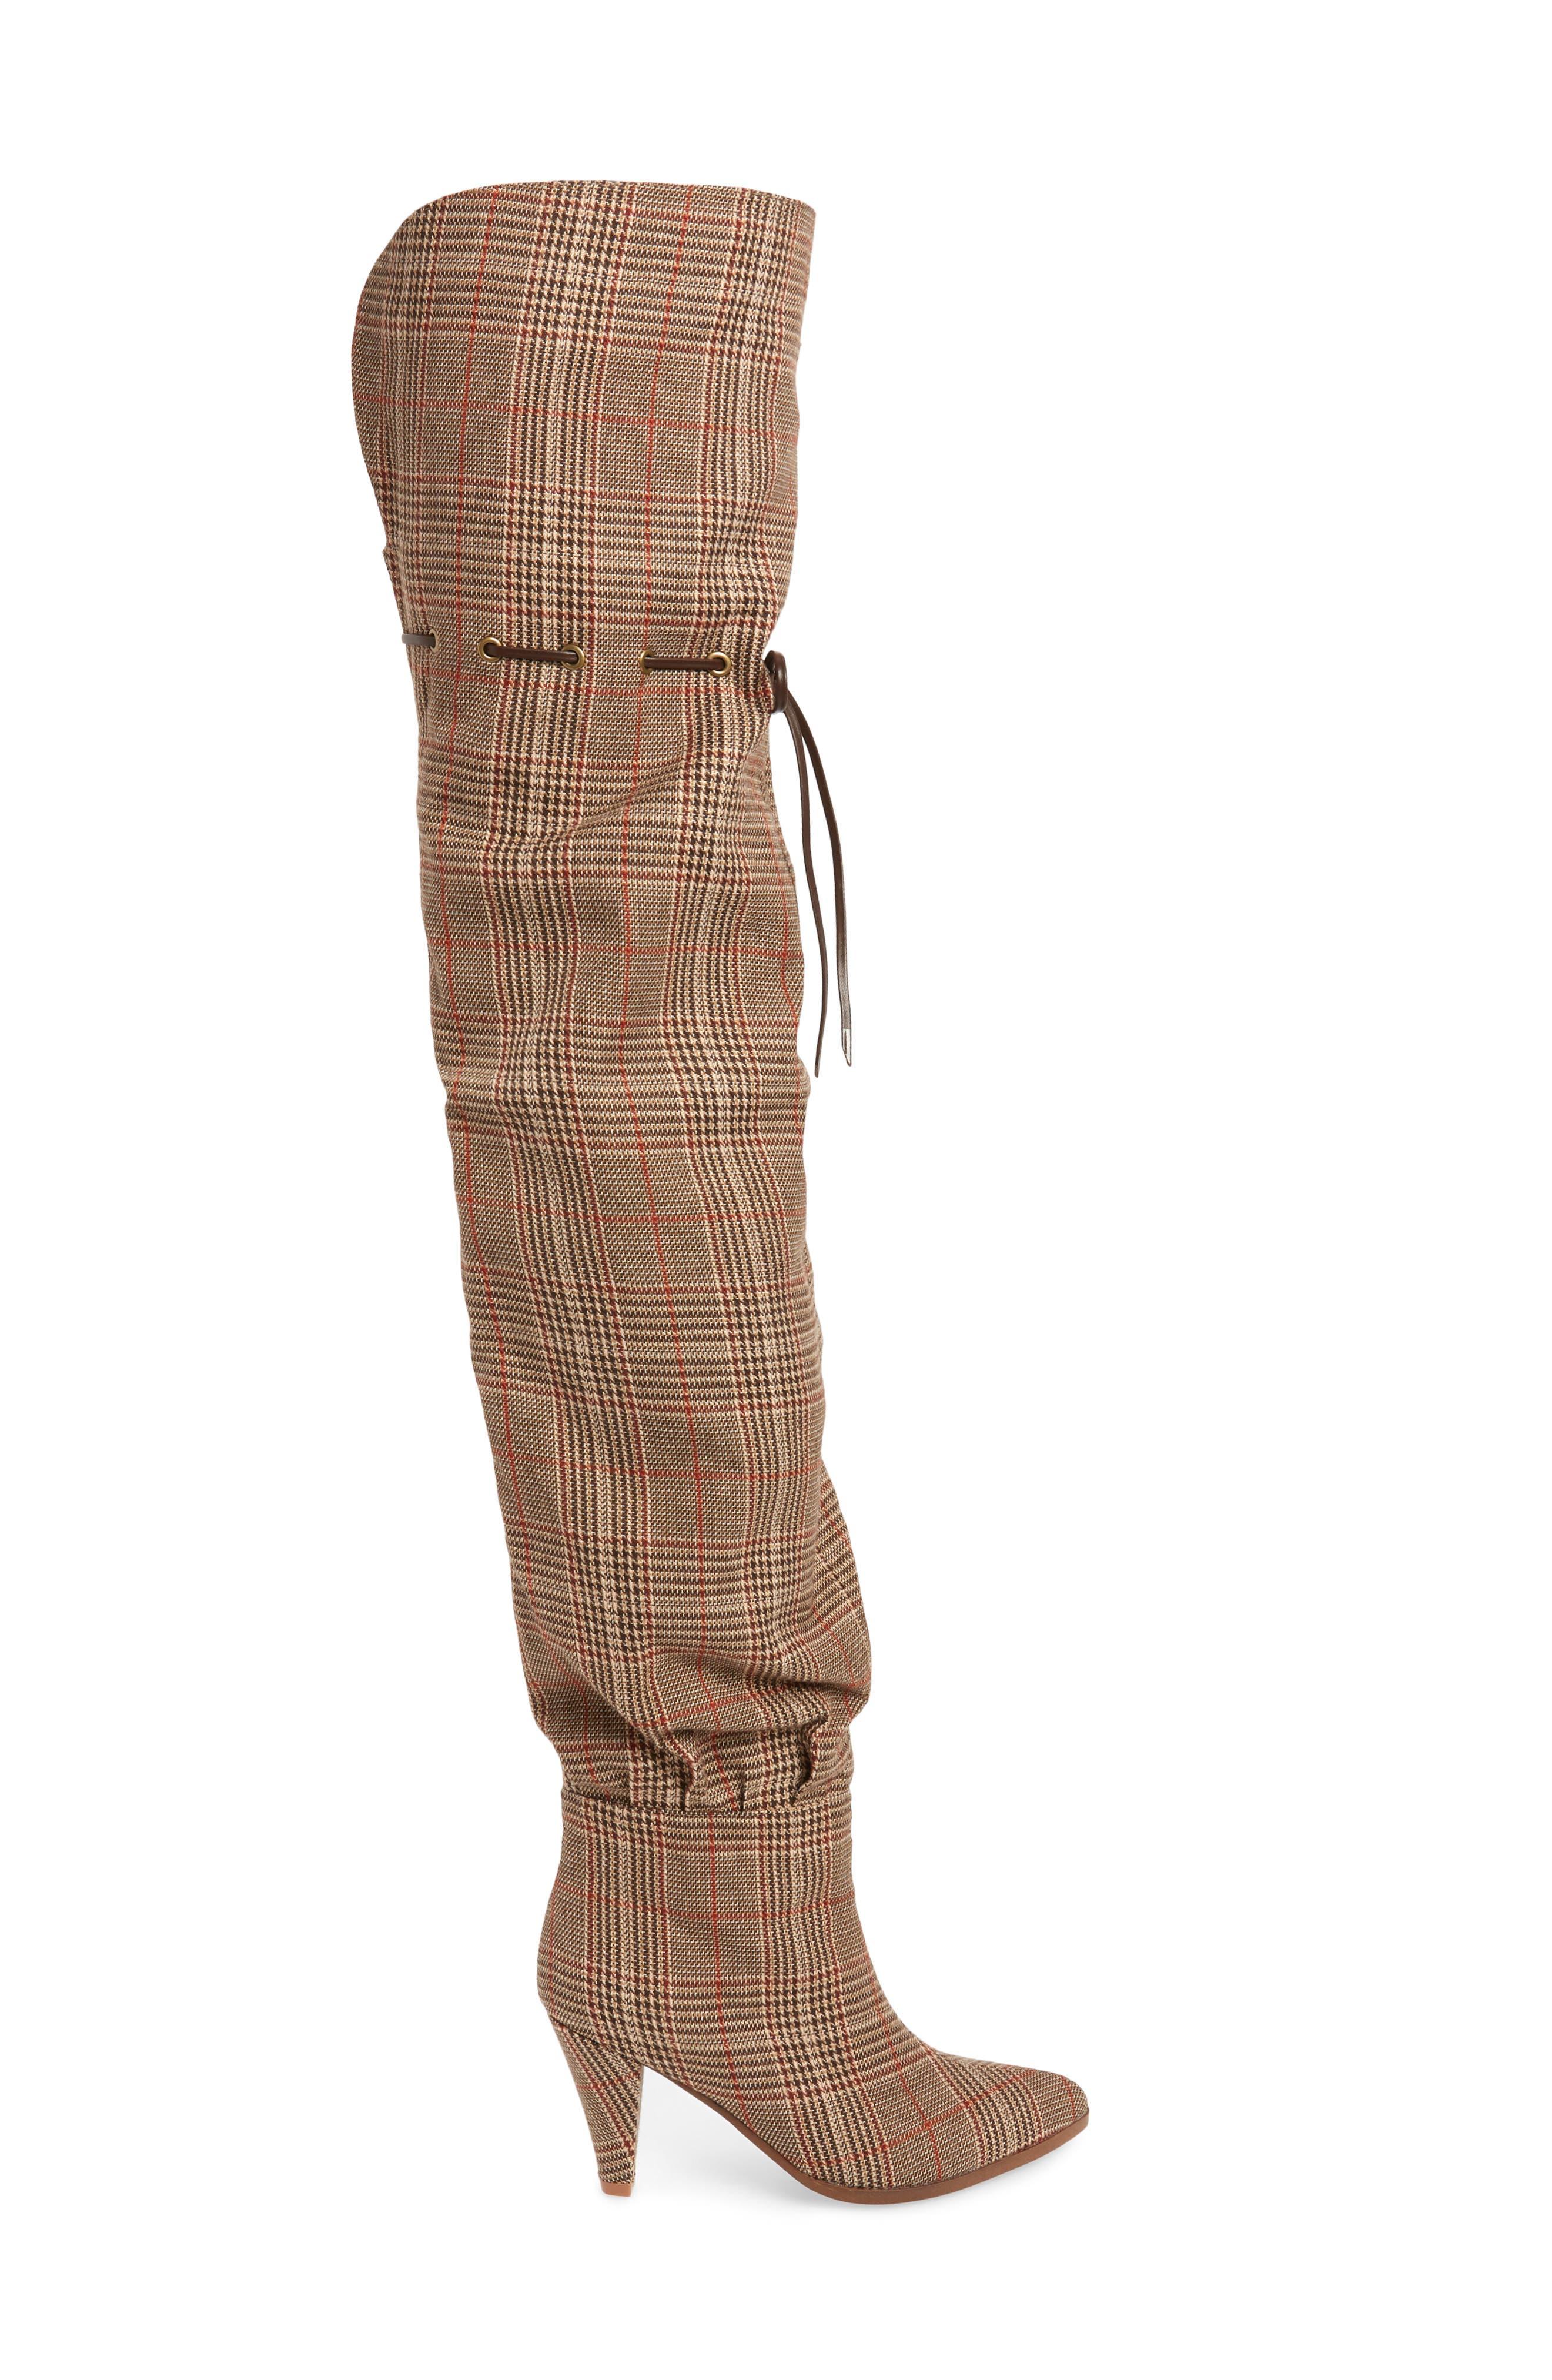 Go-Go-Girl Thigh High Boot,                             Alternate thumbnail 3, color,                             BEIGE PLAID